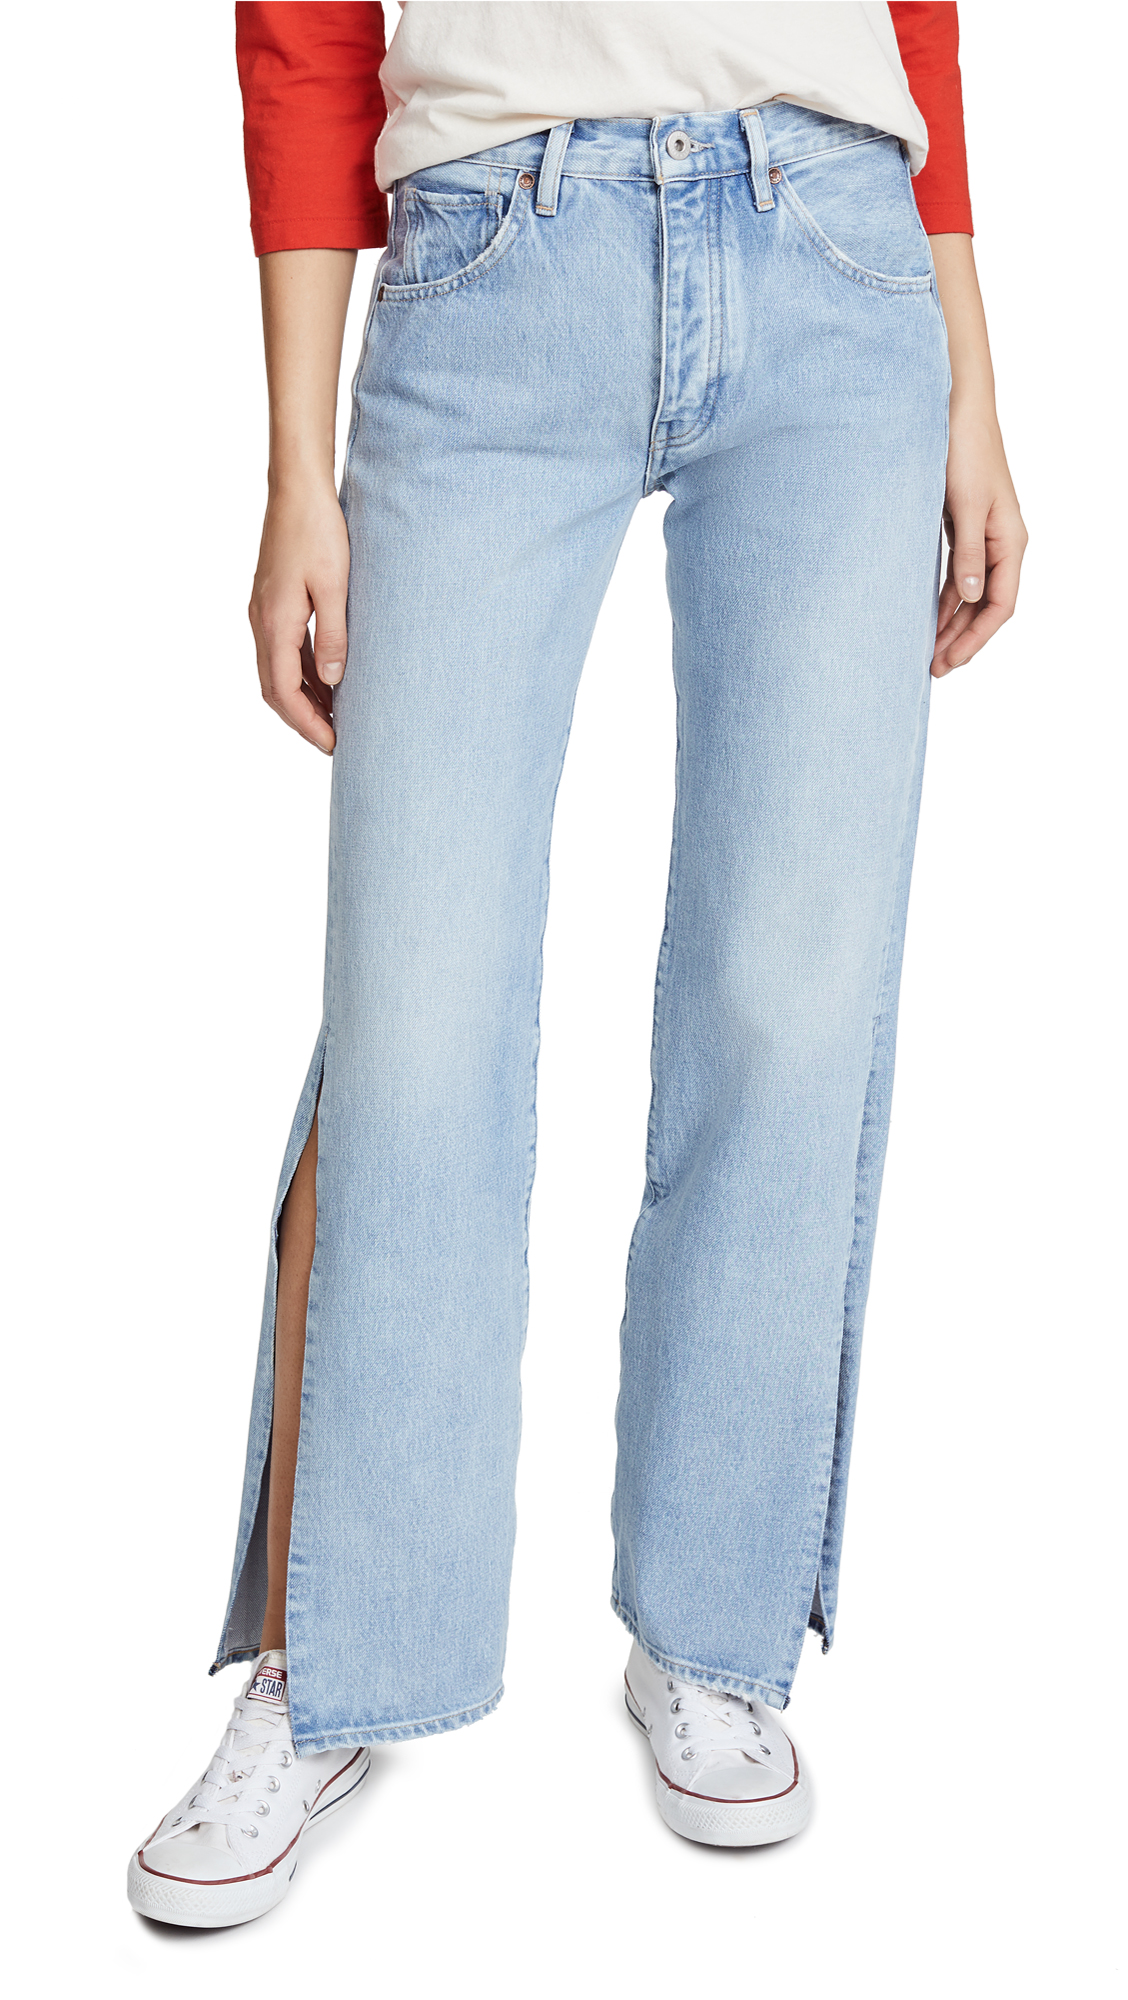 Levi's LMC x SHOPBOP Split Arrow Wide Leg Jeans